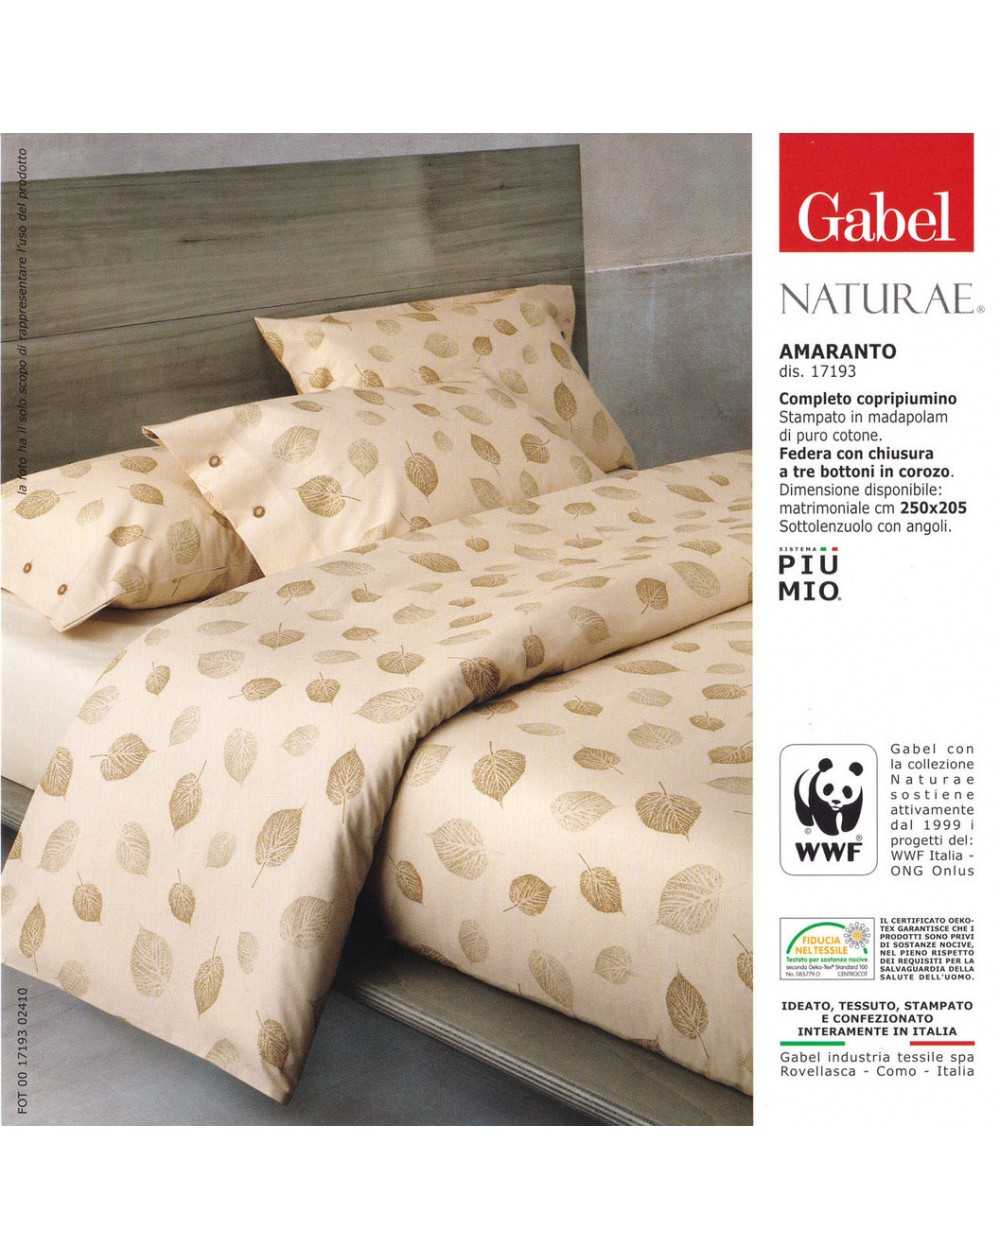 Copripiumino Matrimoniale King Size.Duvet Set Super King Size Bed Amaranto By Gabel